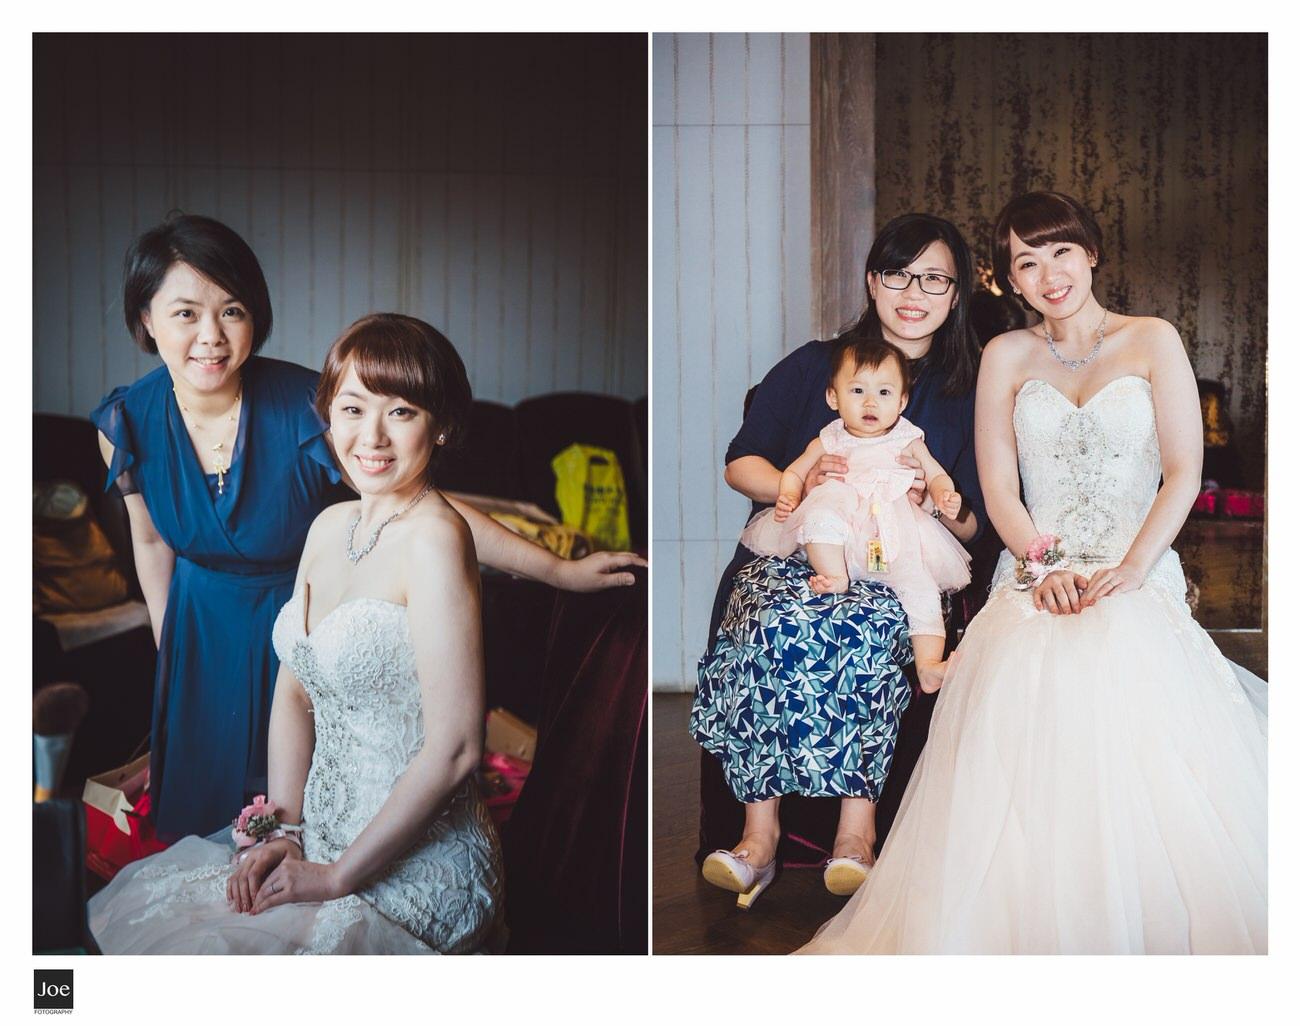 joe-fotography-wedding-photo-palais-de-chine-hotel-015.jpg